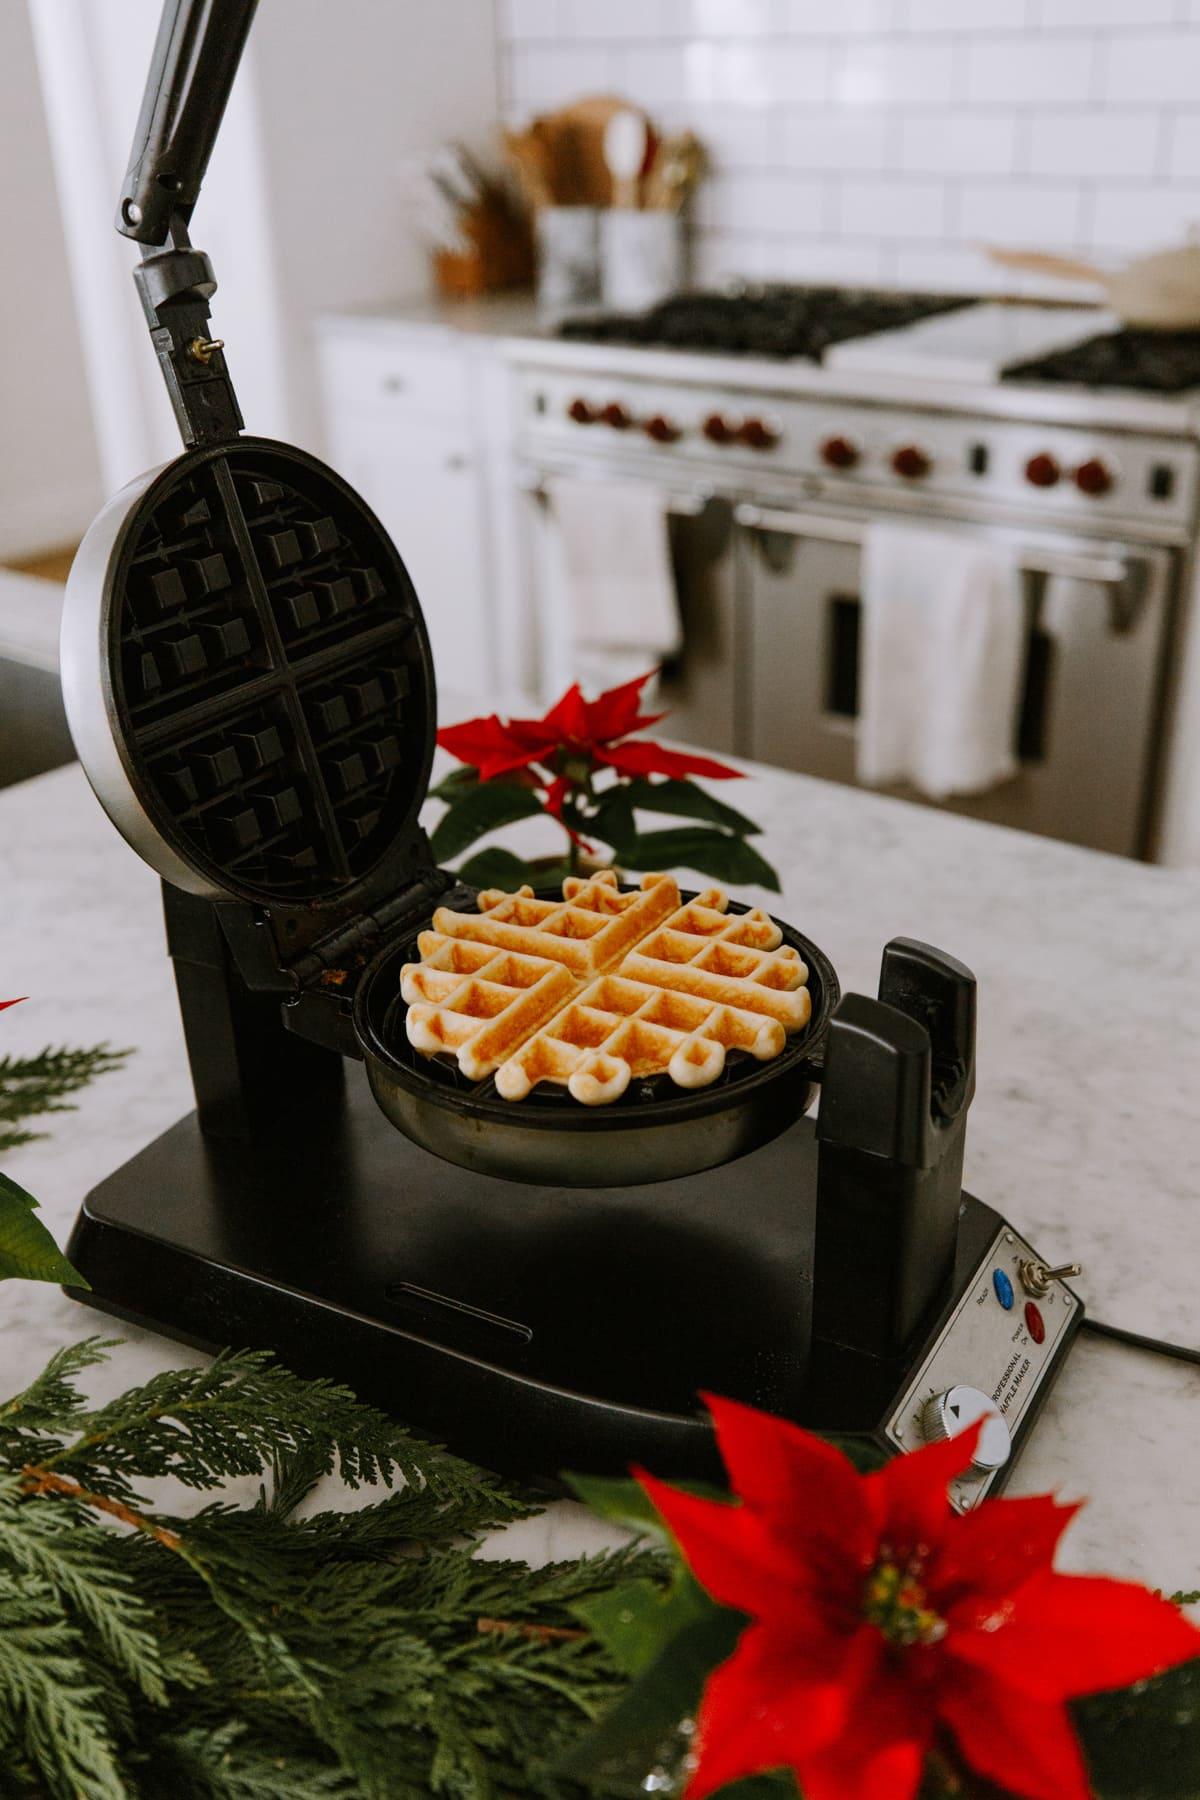 waffle maker on sale certified refurbished